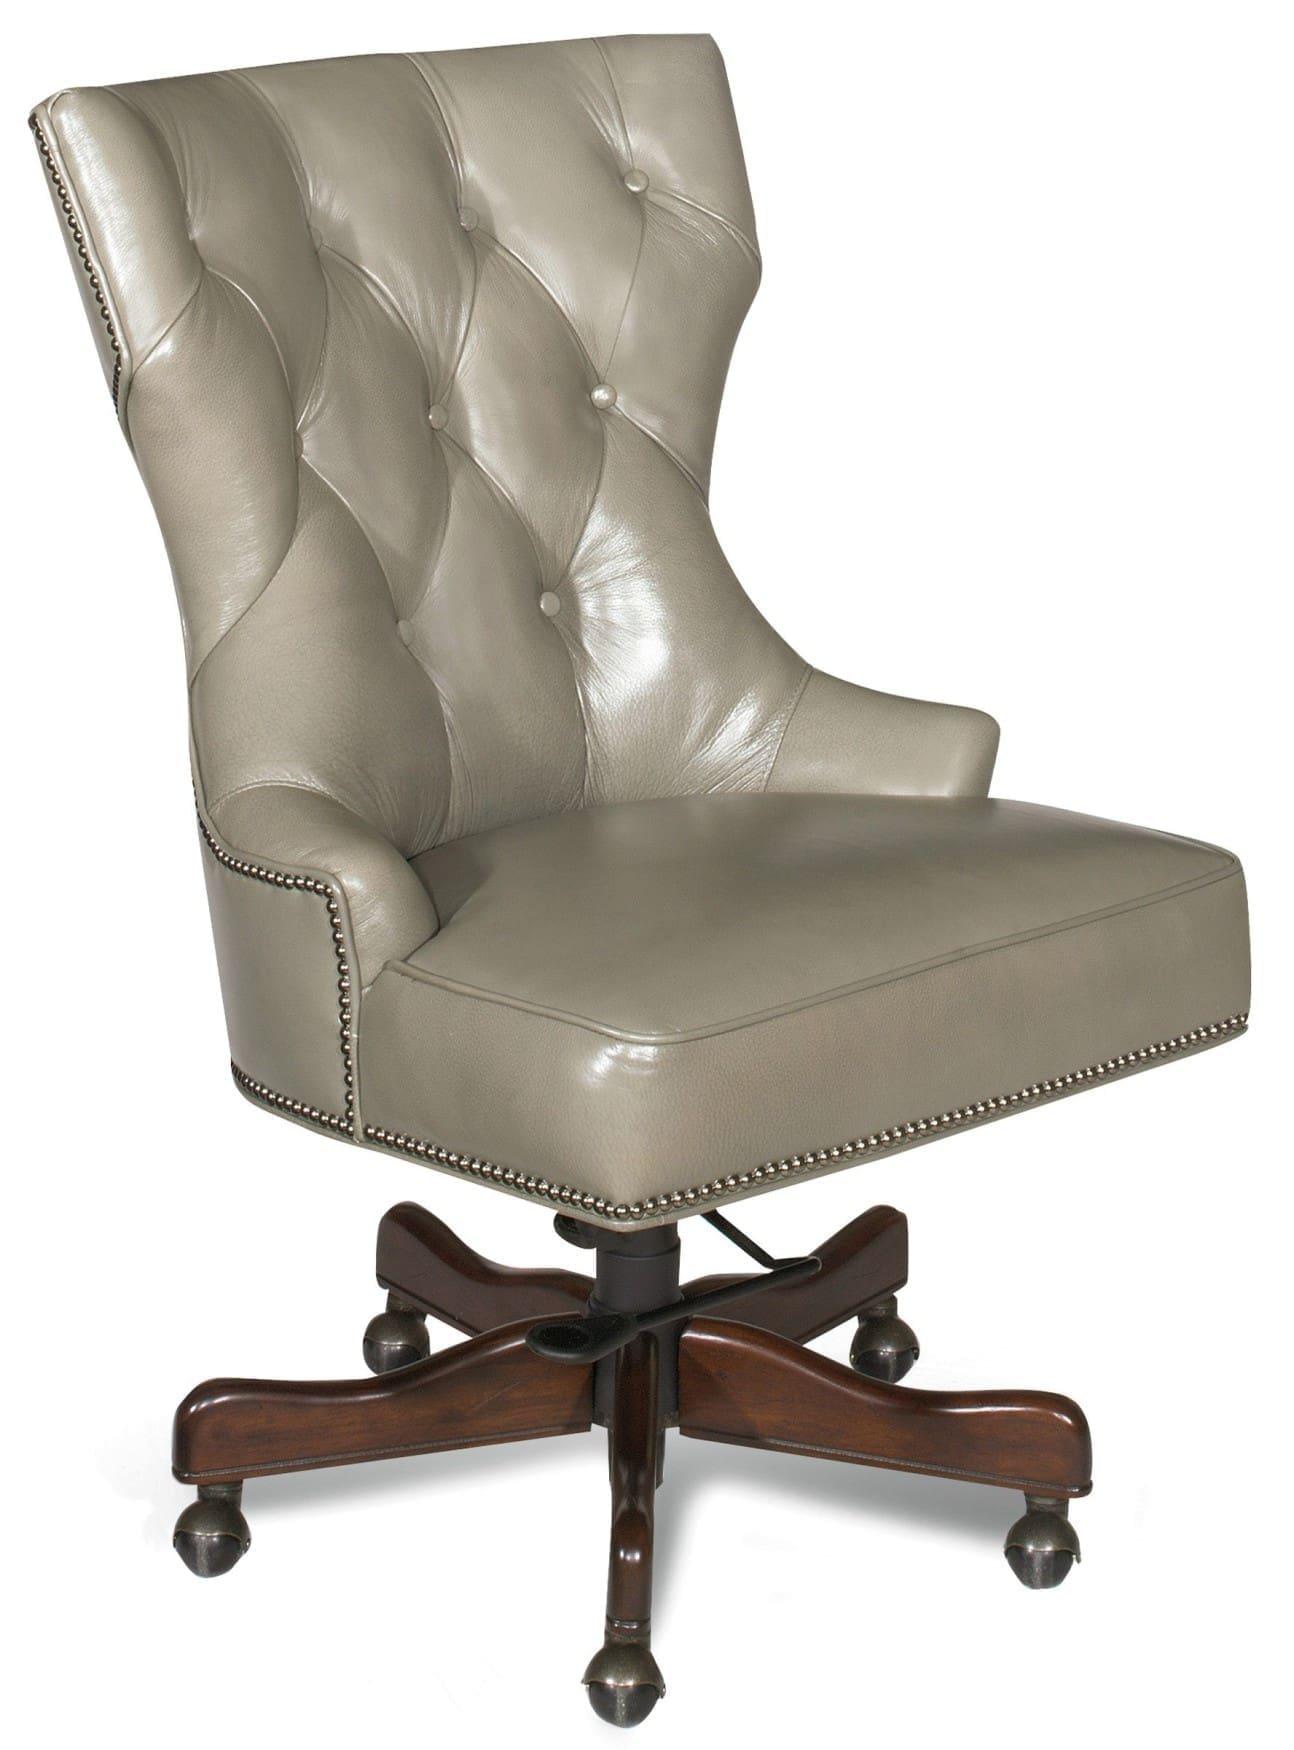 Primm Executive Swivel Tilt Chair